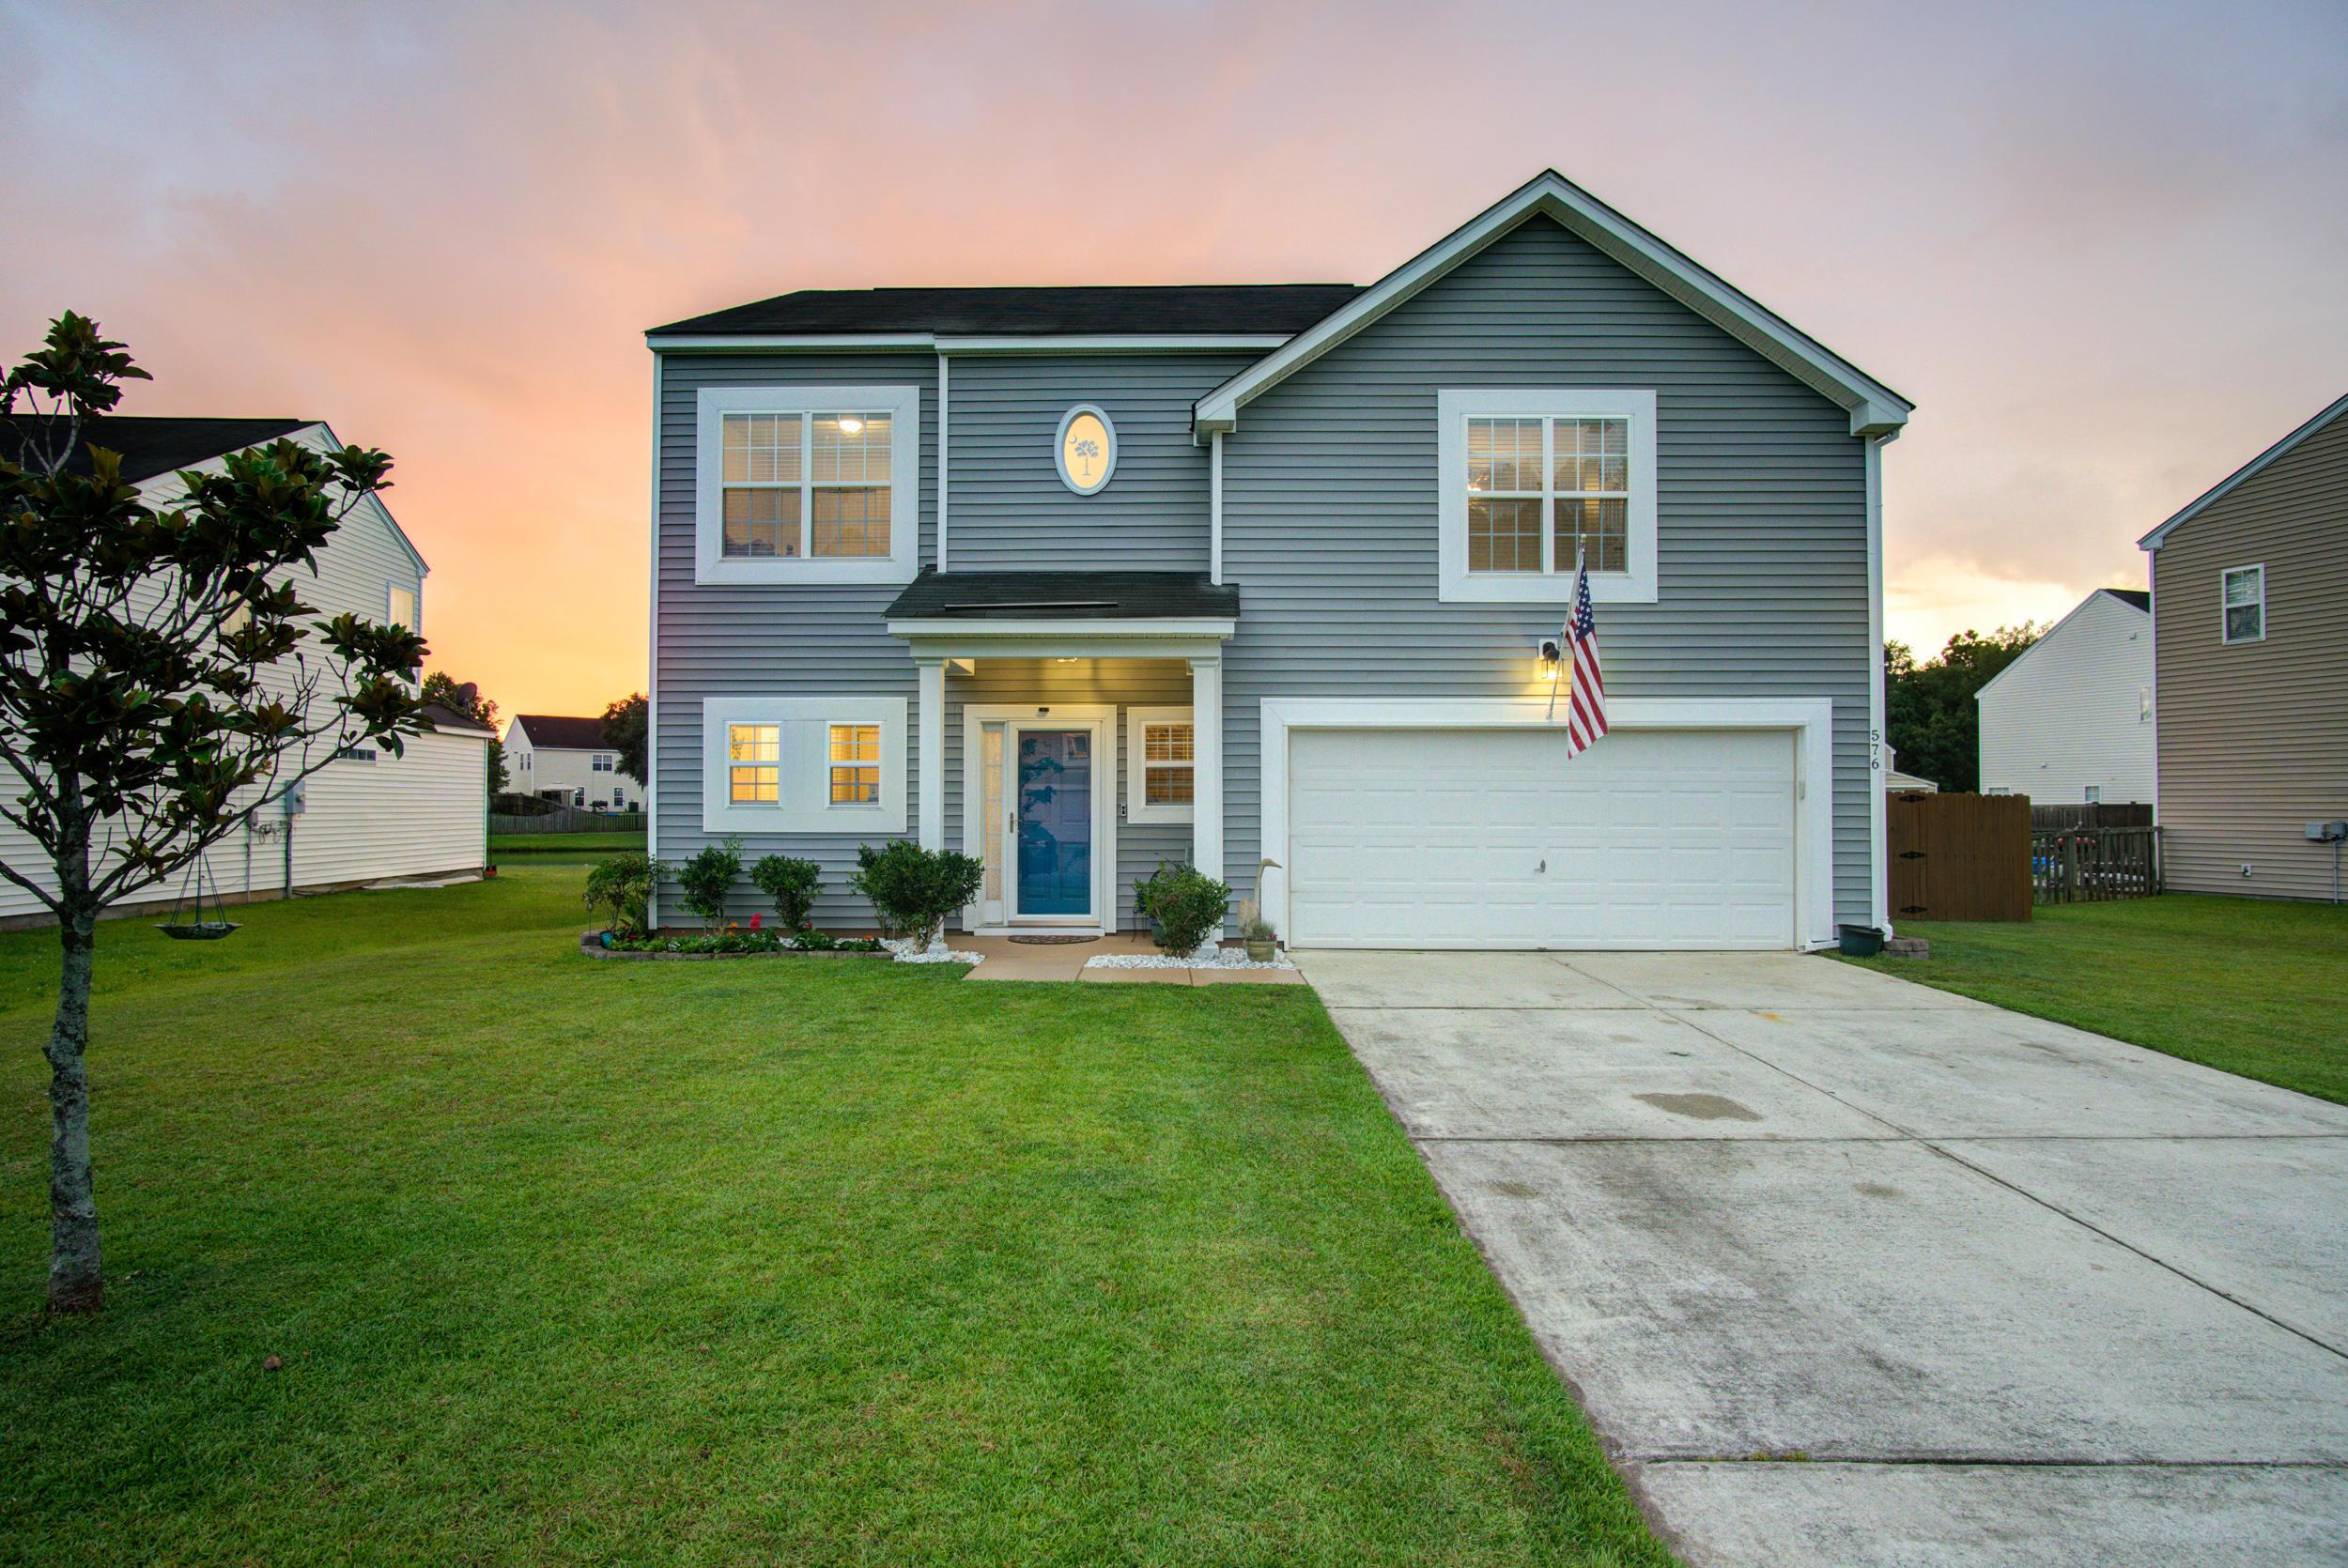 Oakley Pointe Homes For Sale - 576 English Oak, Moncks Corner, SC - 62